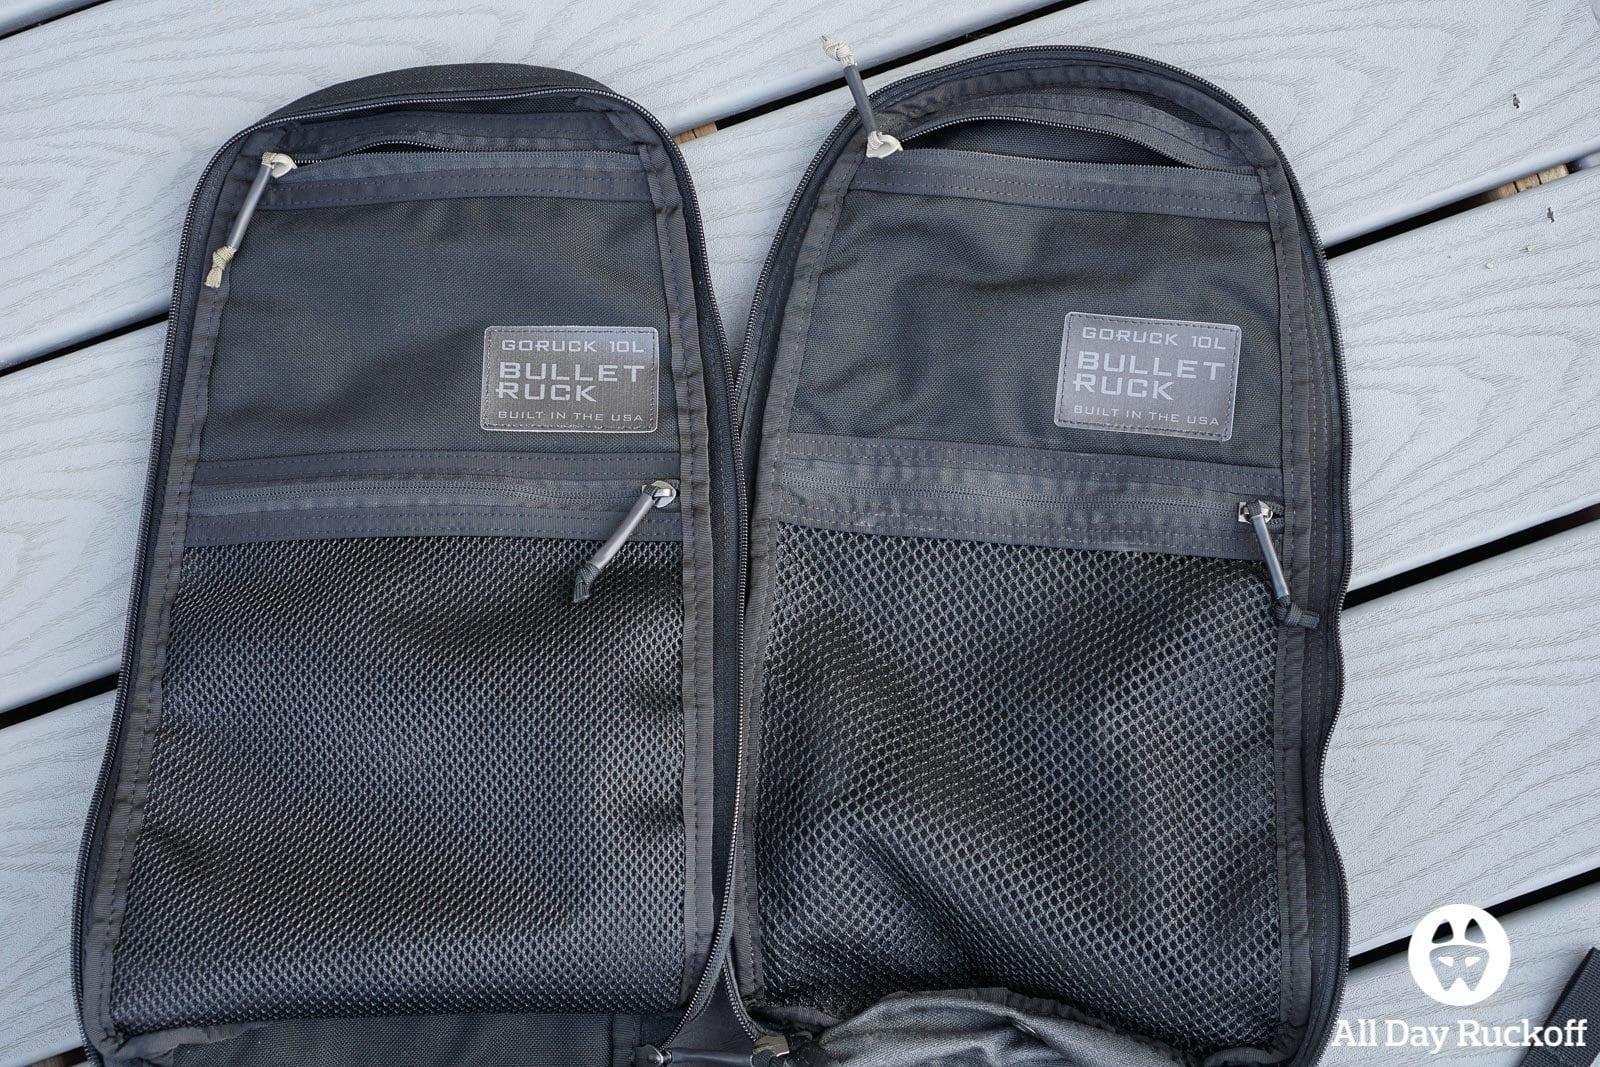 GORUCK Bullet Ruck 10L Comparison - Inside Pockets